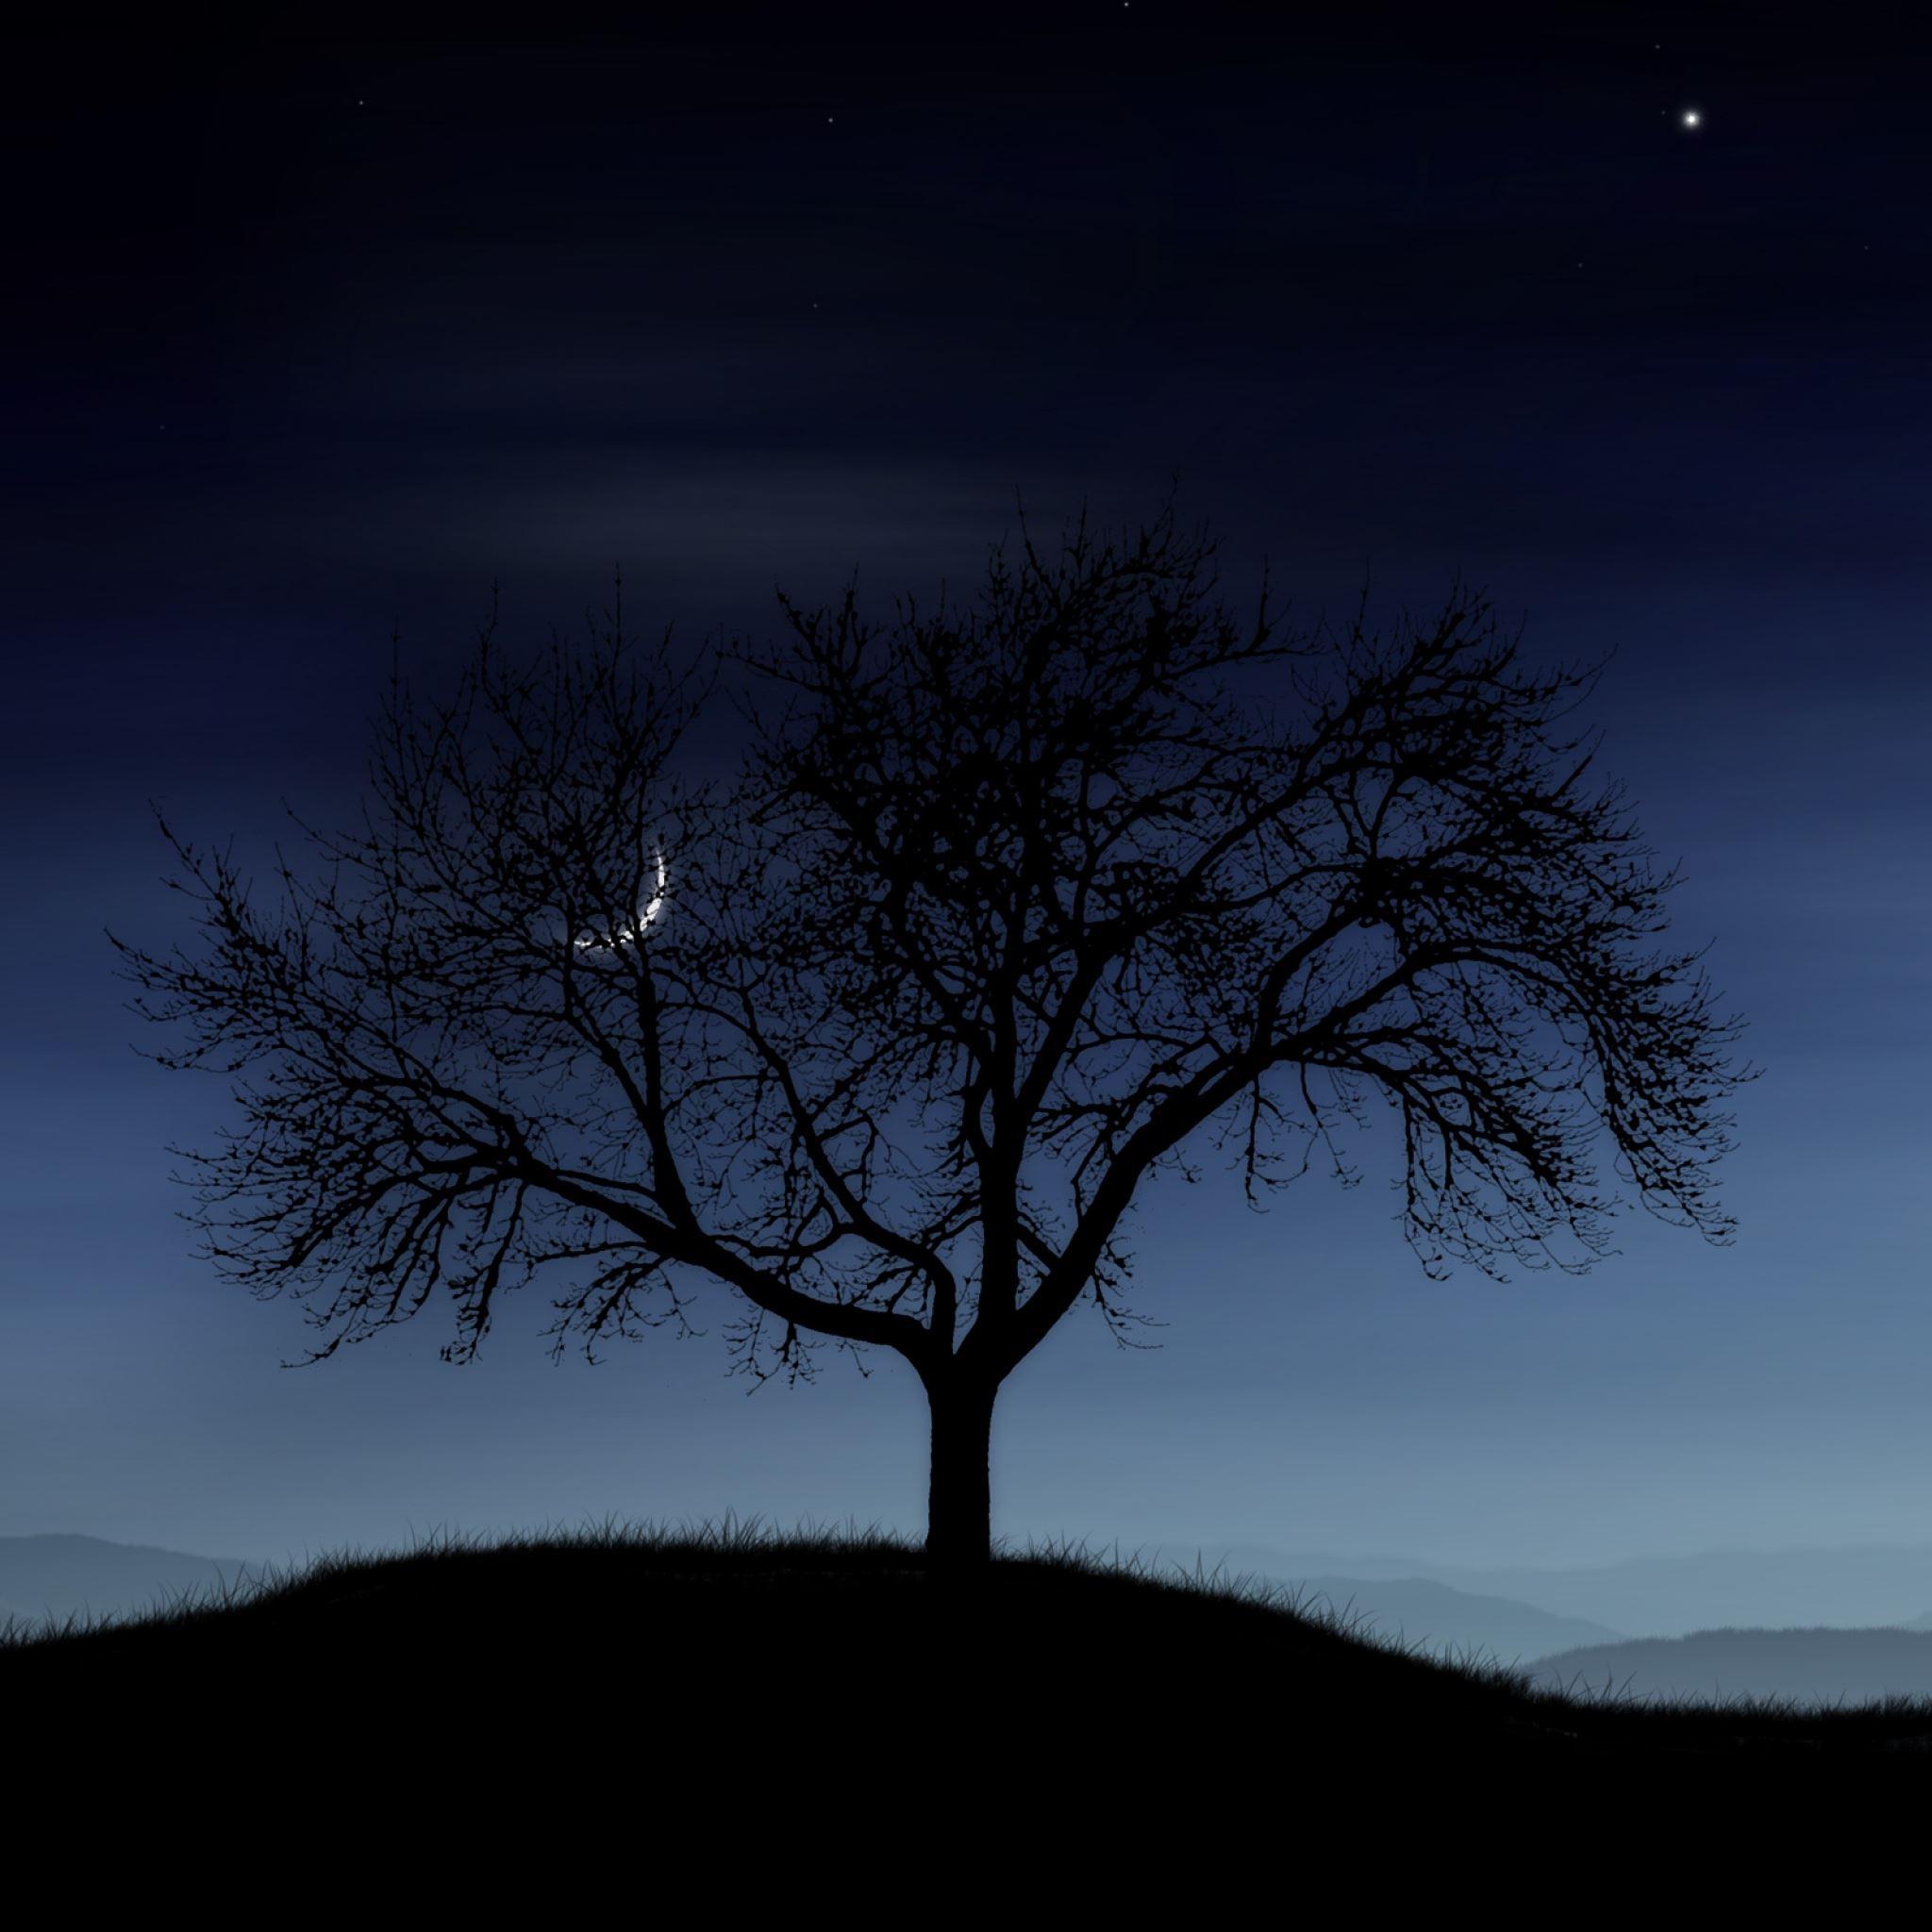 Tree night lonely silhouette stars moon fog iPad Air wallpaper